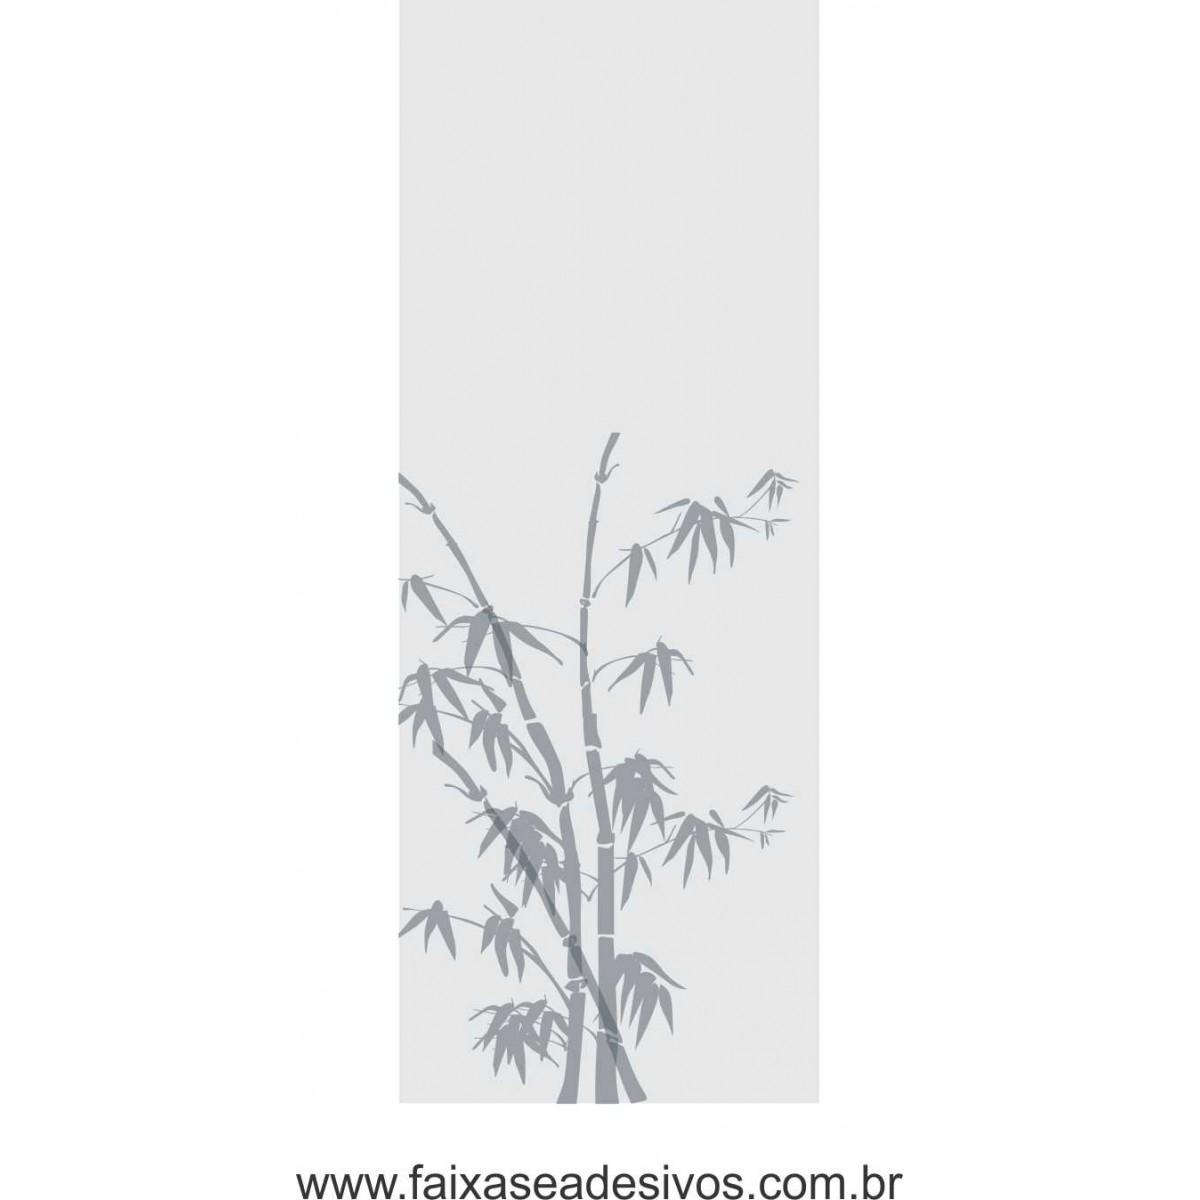 084 VD - Adesivo Jateado para vidro Bamboo 200x70cm  - FAC Signs Impressão Digital